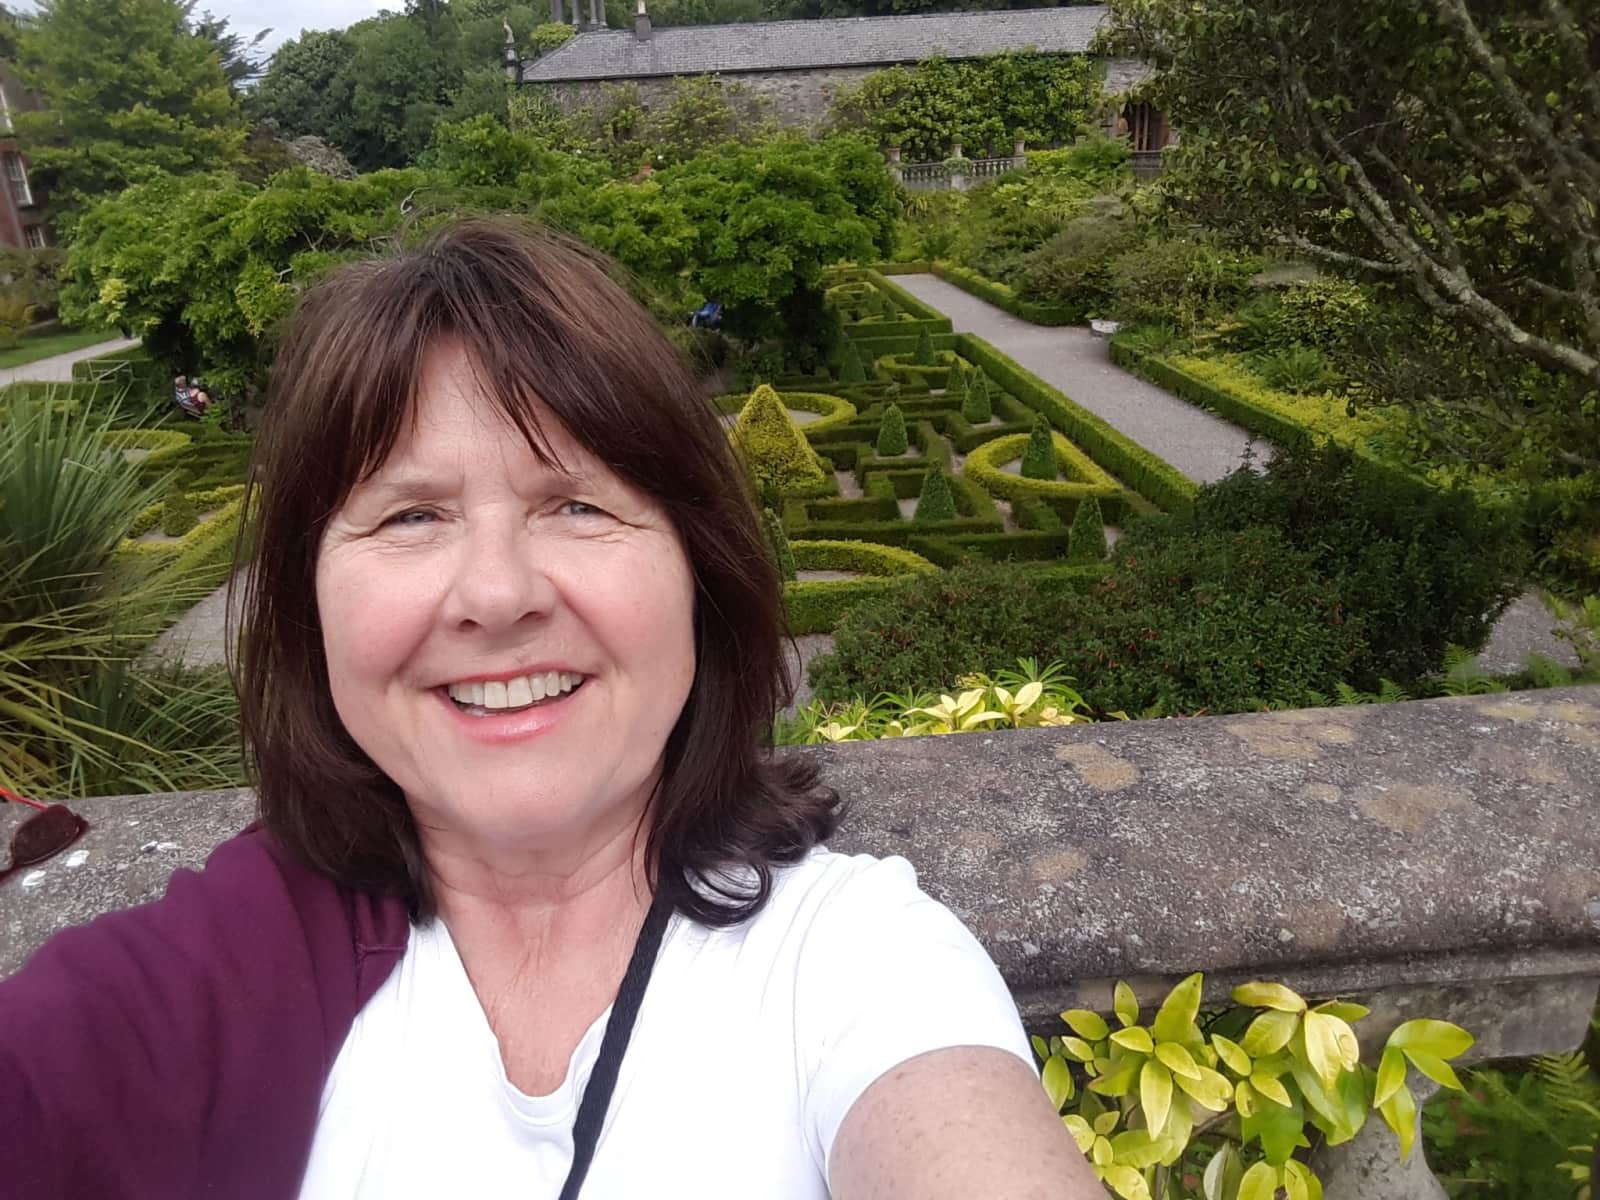 Linda from Spanish Point, Ireland